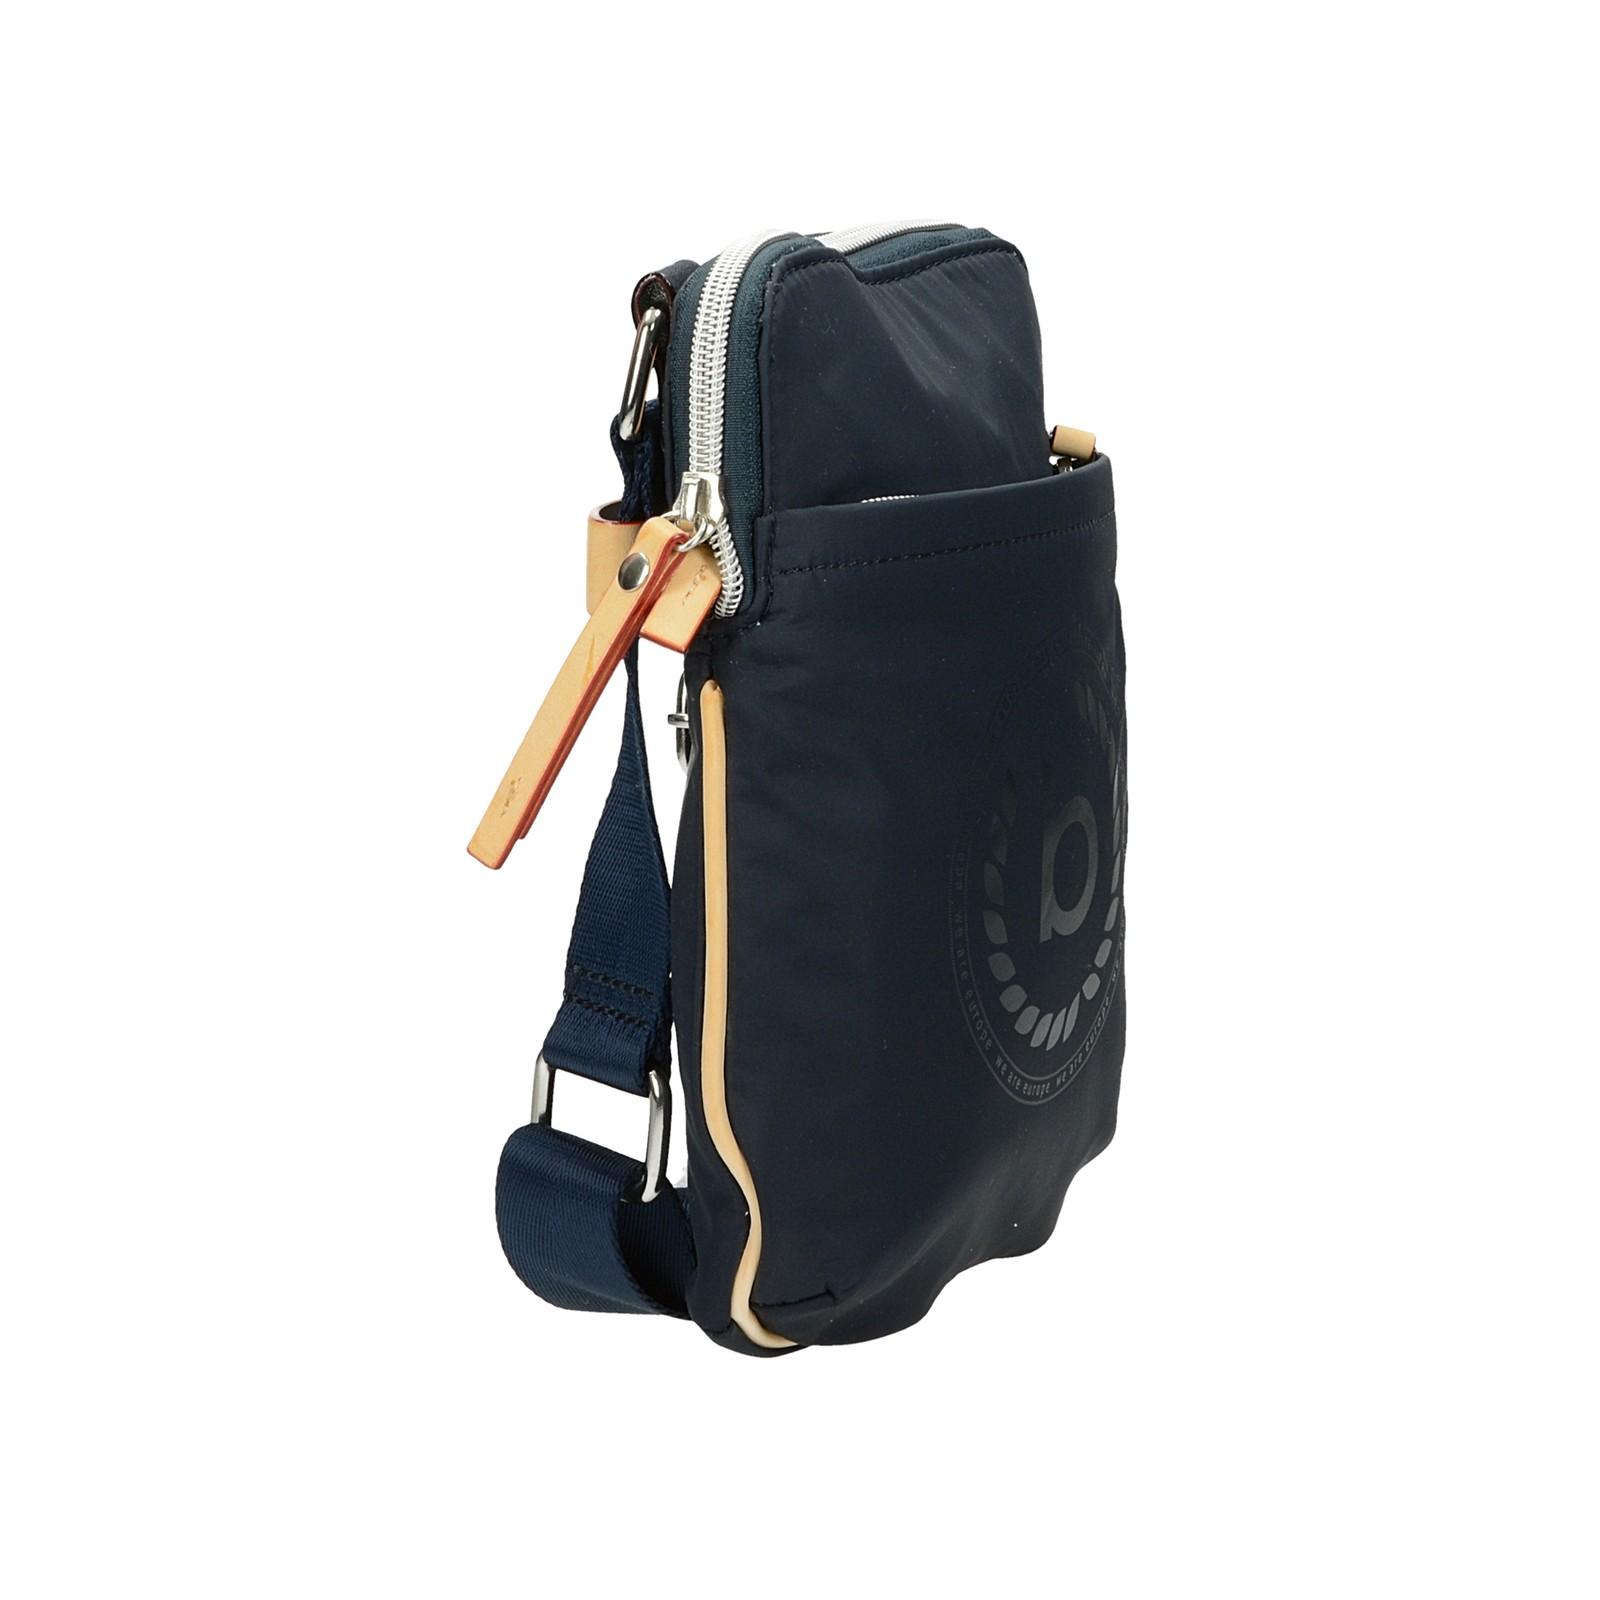 1192e14a780 ... Bugatti pánská stylová crossbody taška - tmavomodrá ...